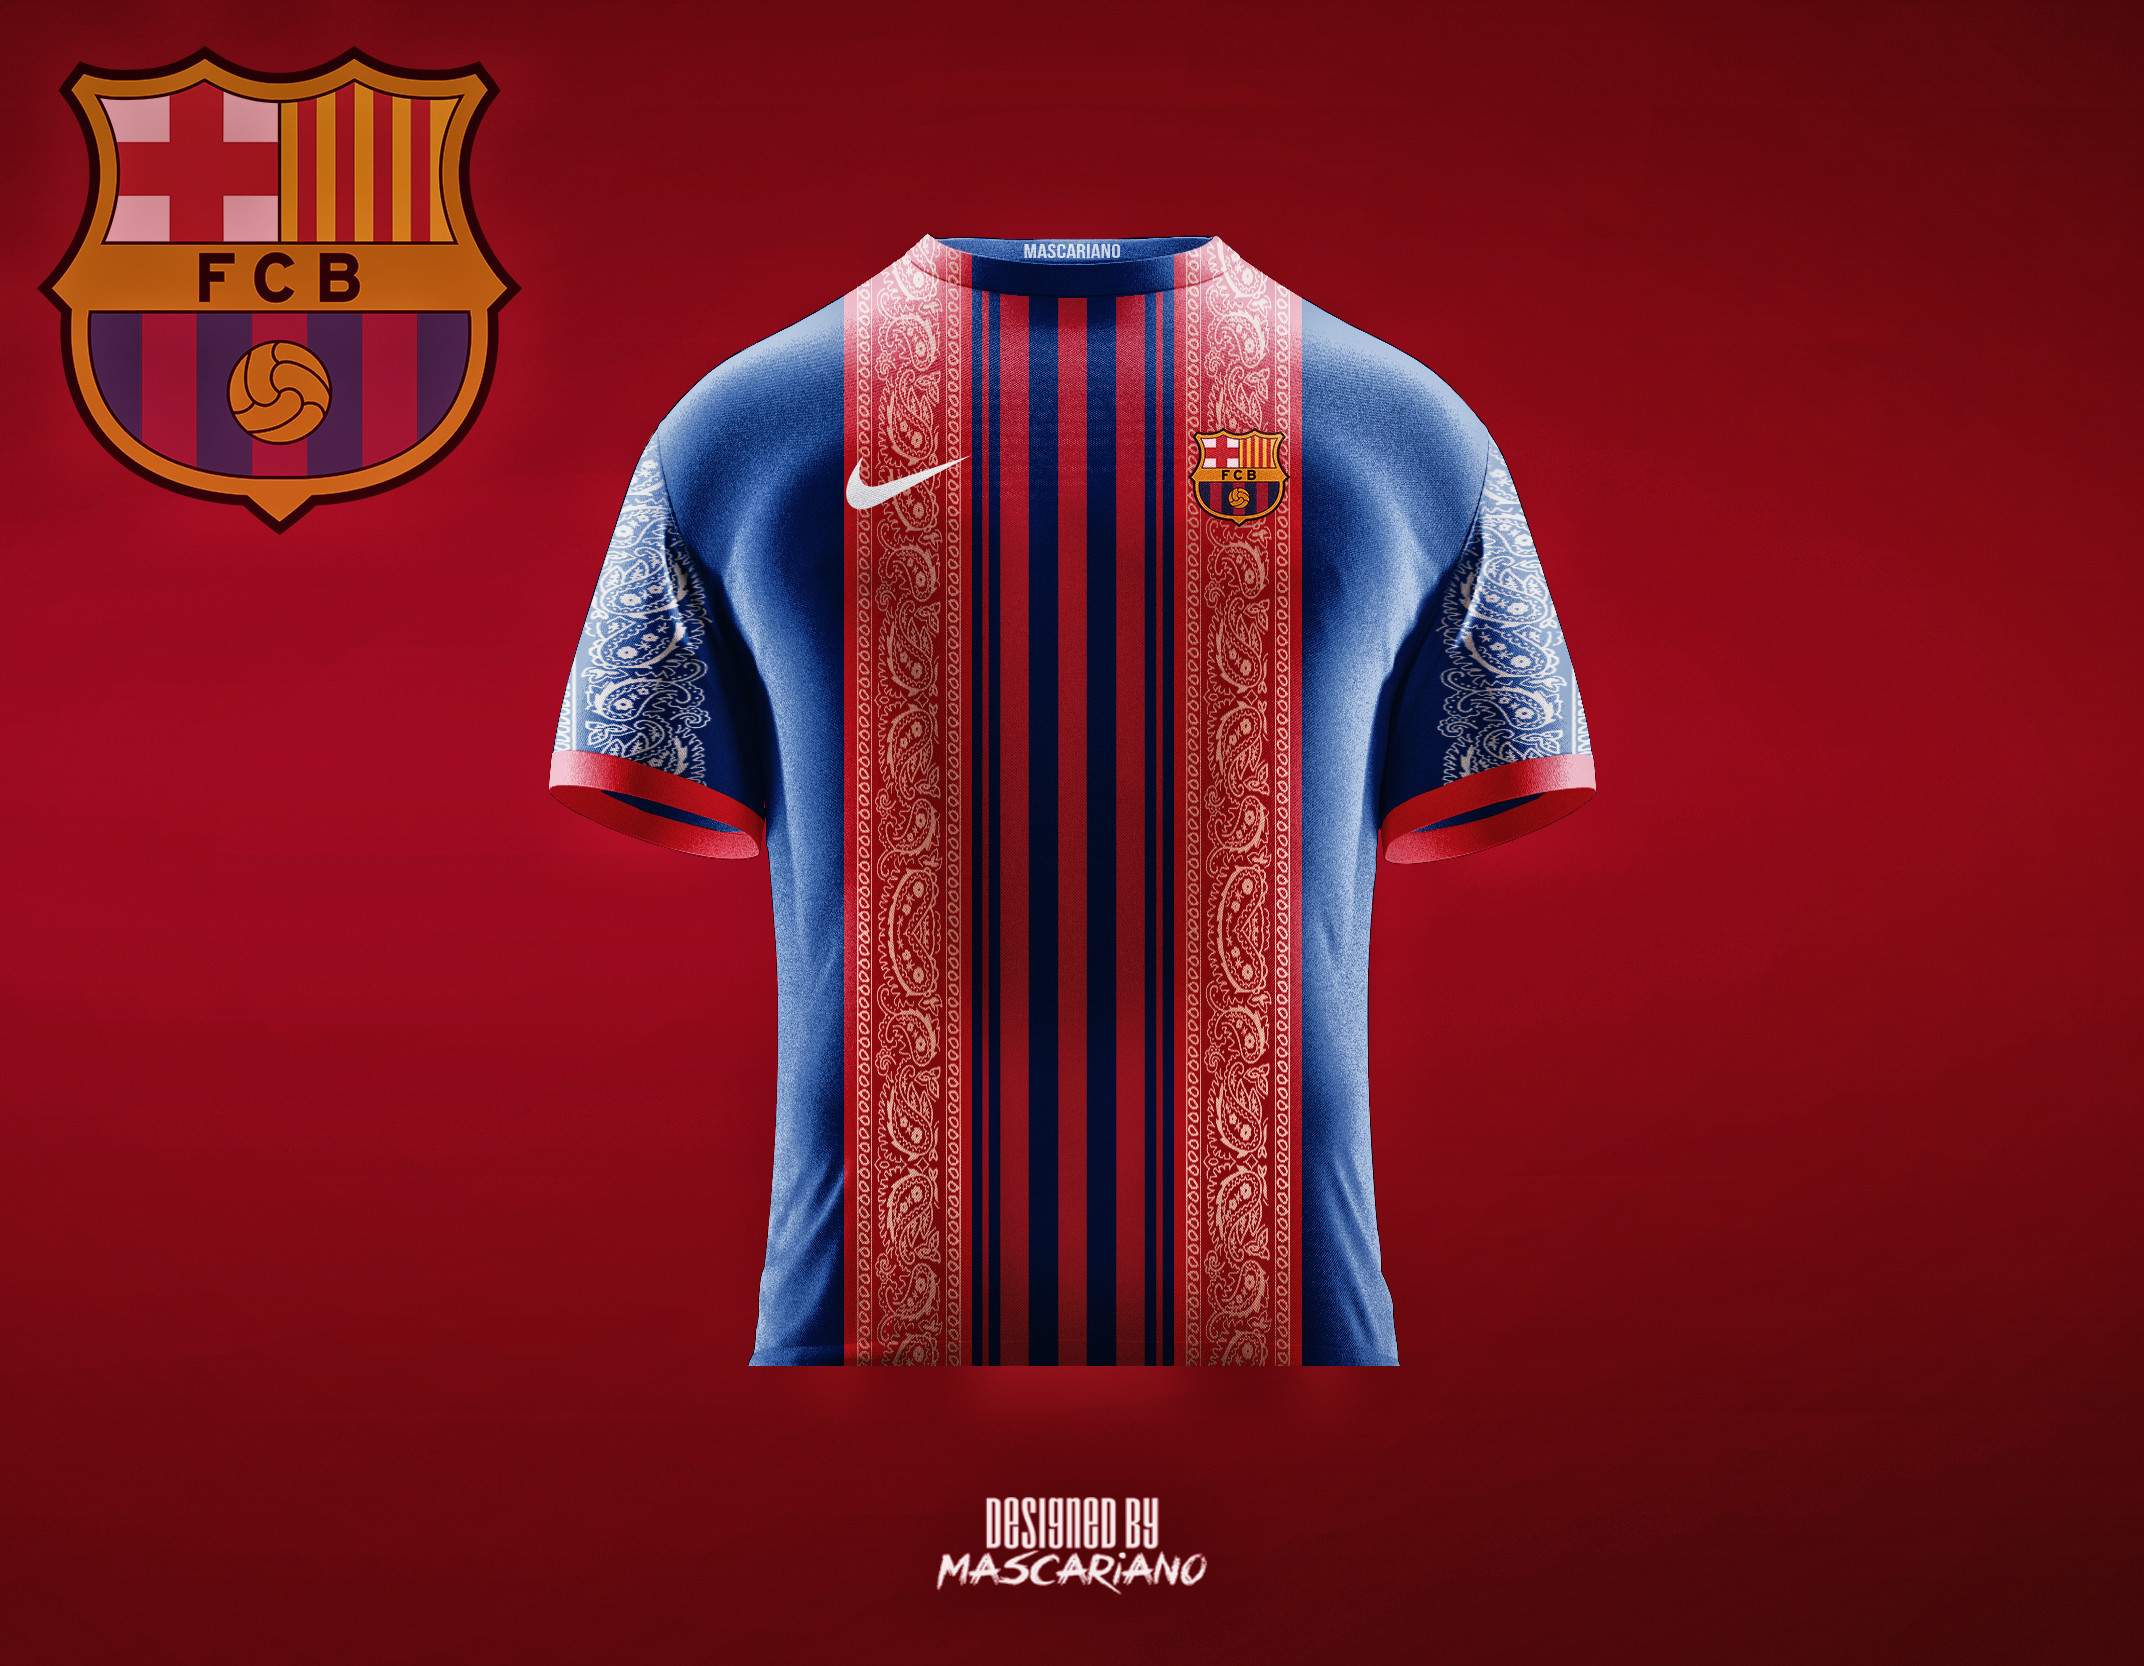 Barcelona HD Wallpaper 2018 68 images 2144x1666